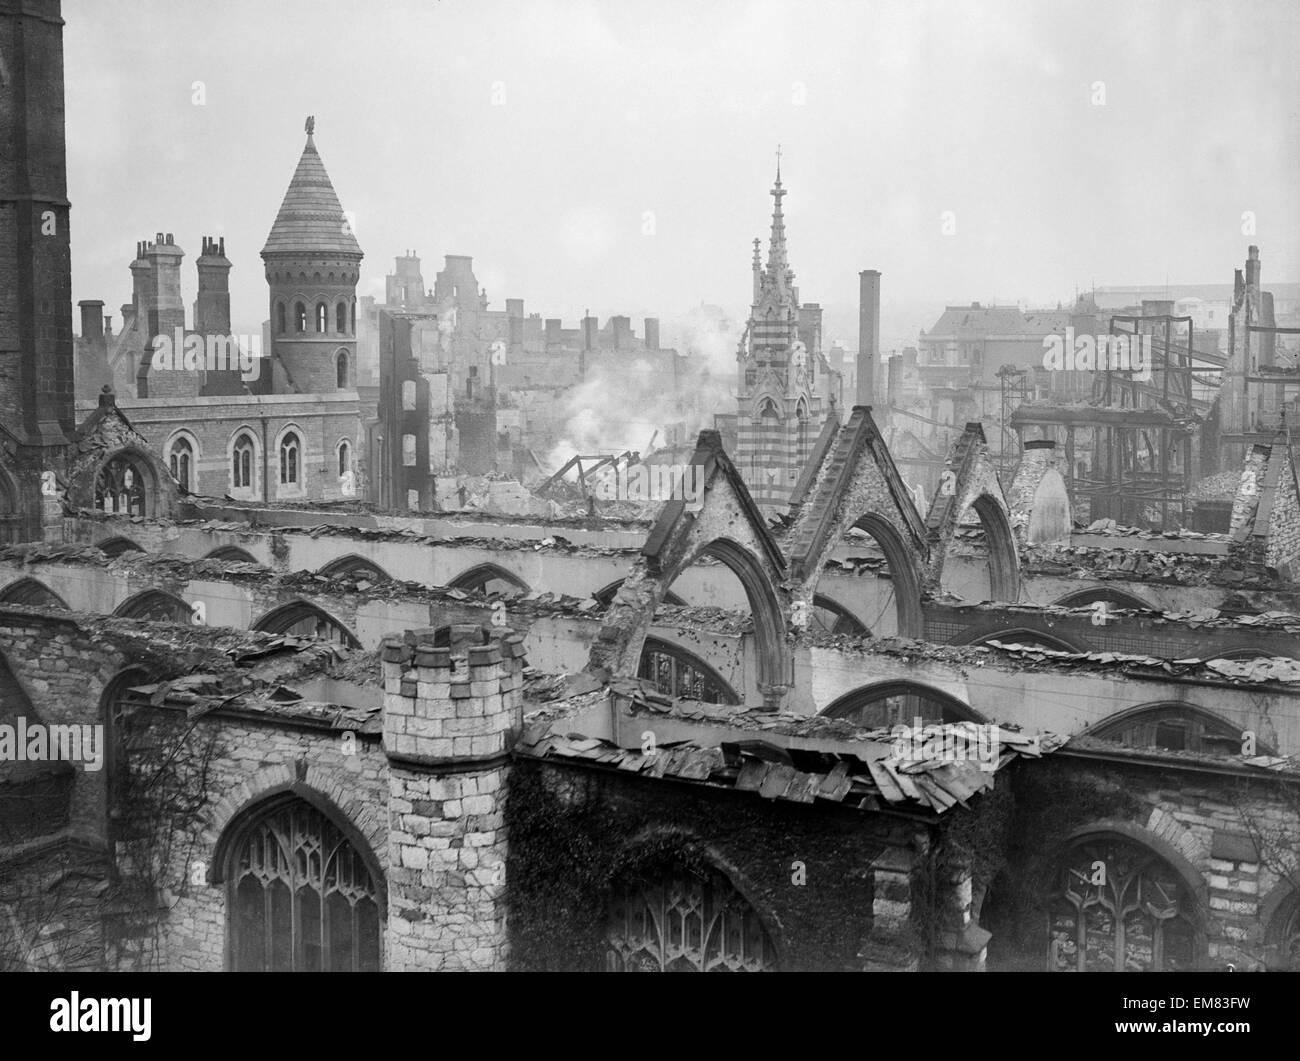 WW2 Air Raid Damage Bomb damage at Plymouth after an air raid by the German Luftwaffe. Circa 1941. - Stock Image